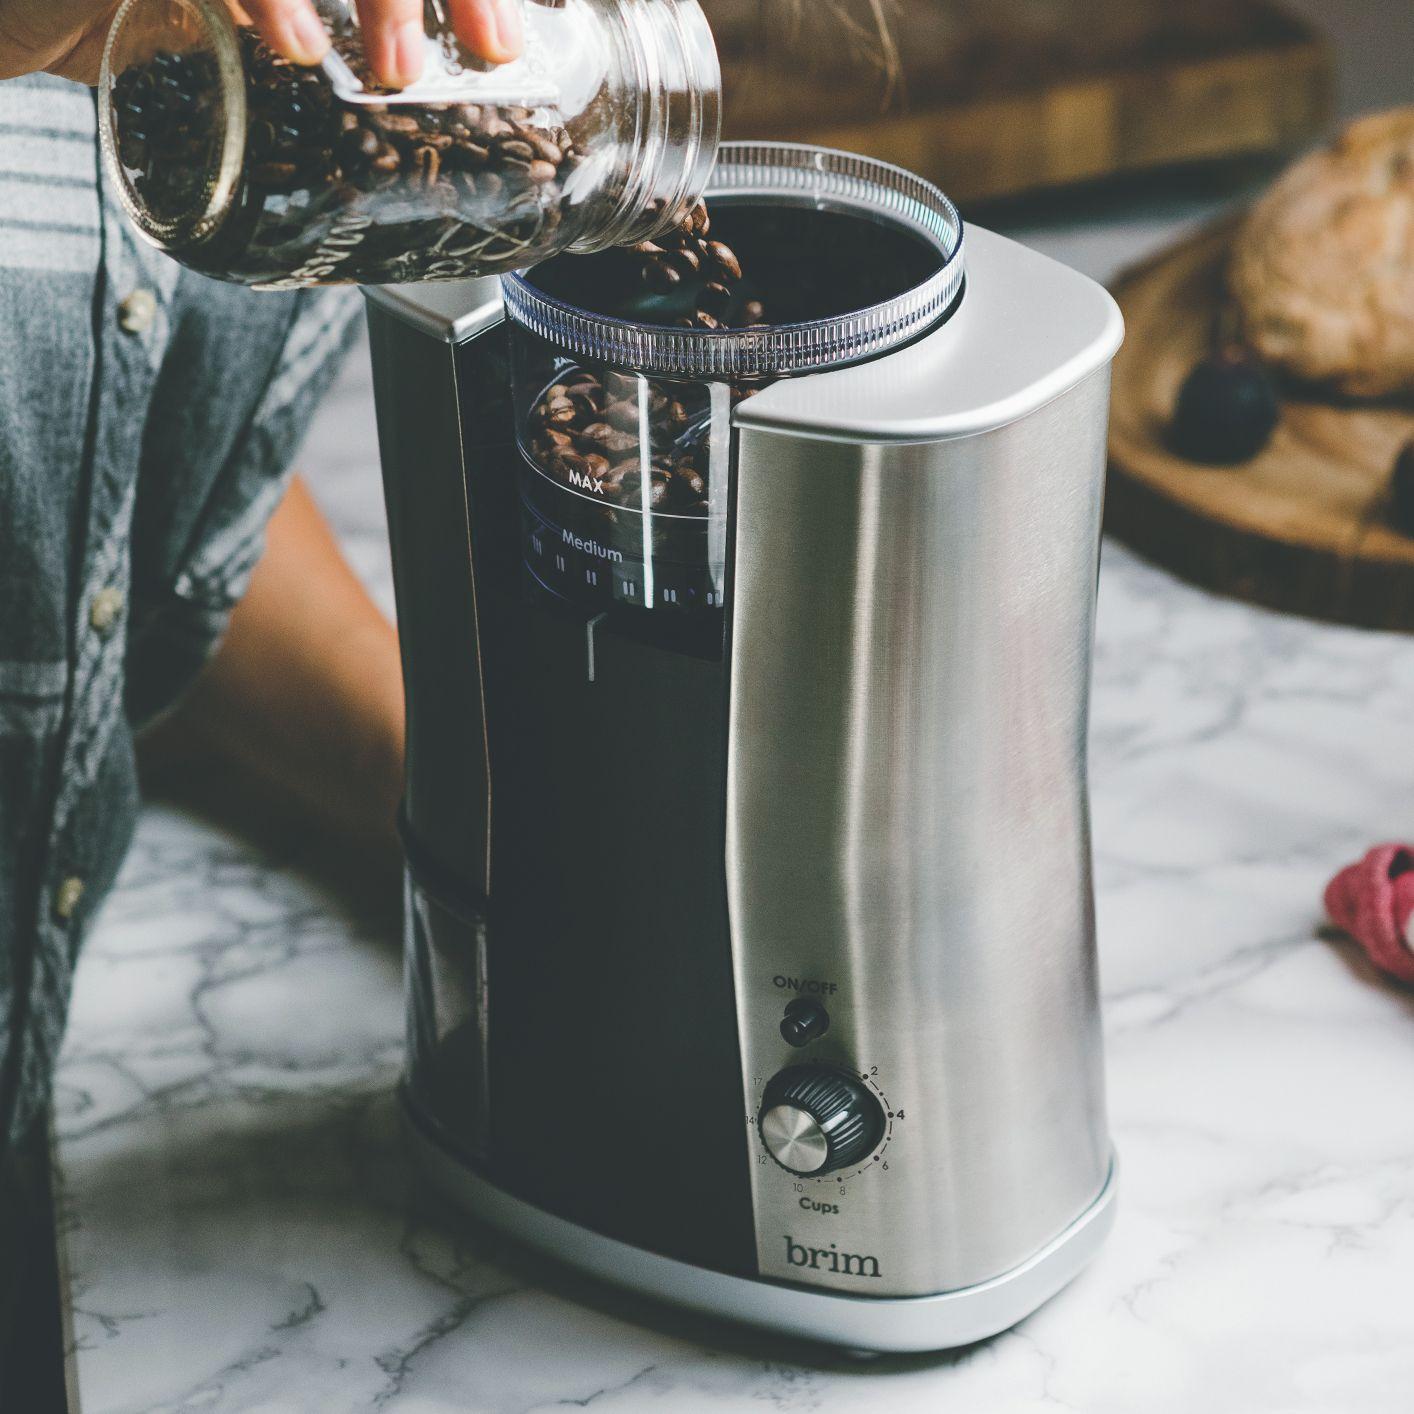 Conical burr grinder brim pour over coffee maker